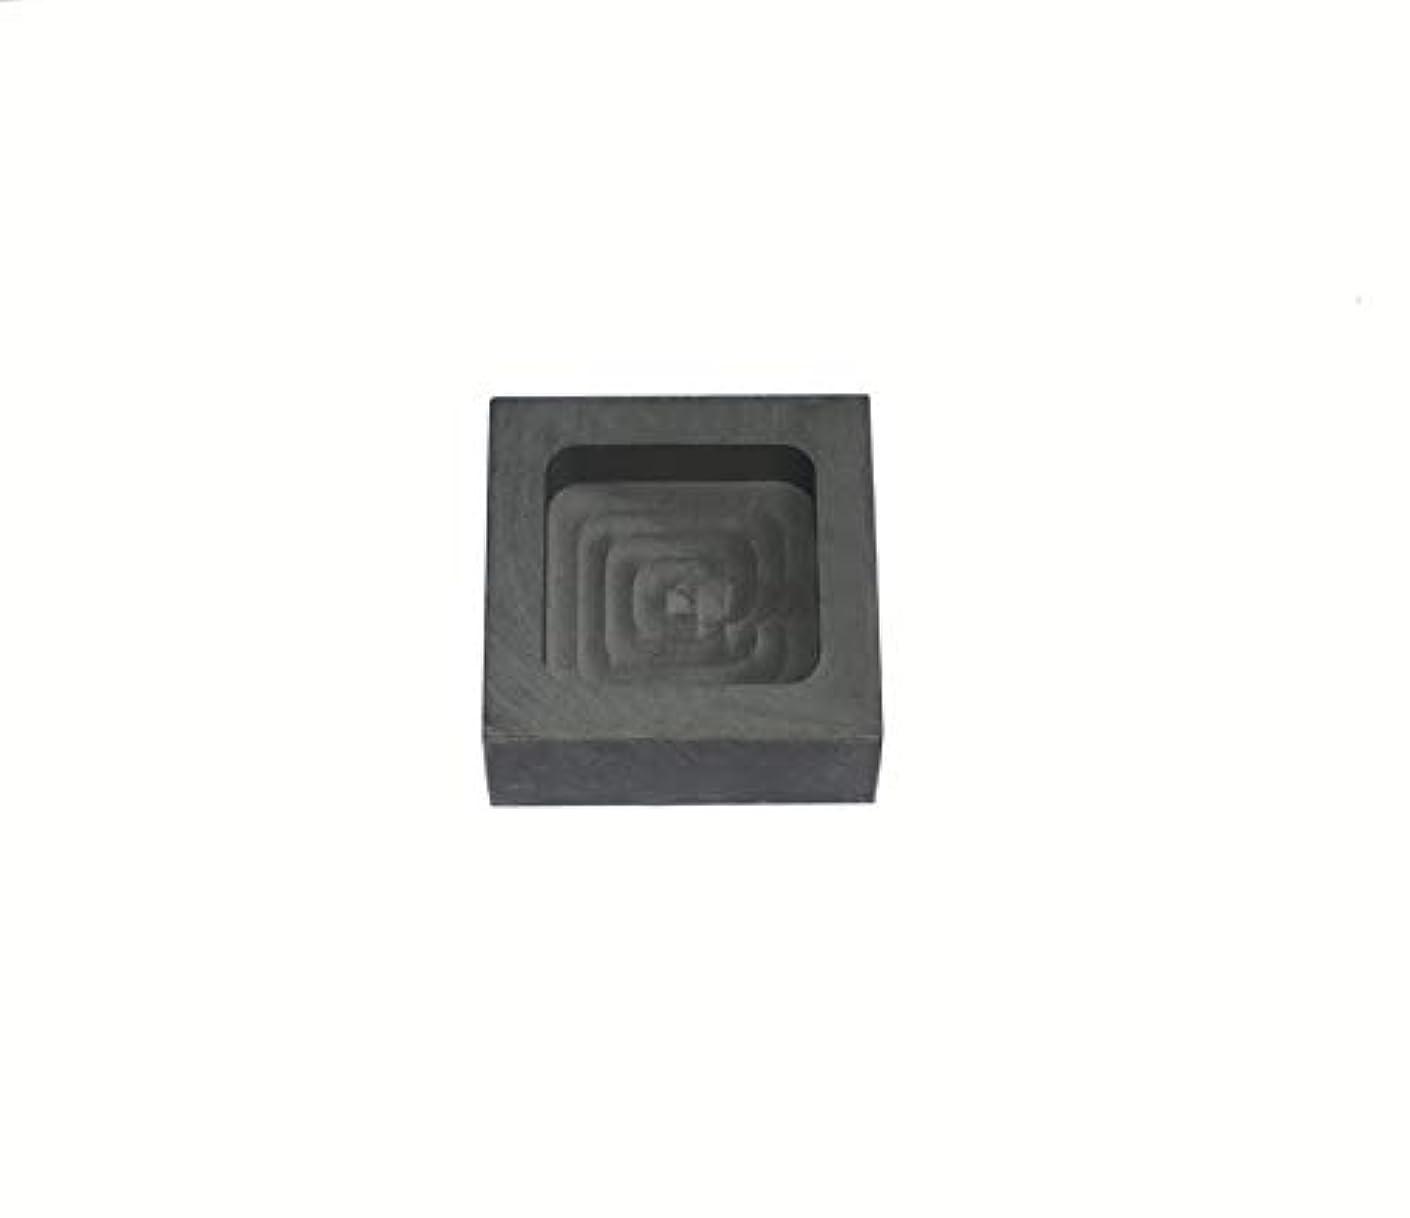 Graphite Ingot Mold Melting Casting Mould for Gold Silver Nonferrous Metal(200g)